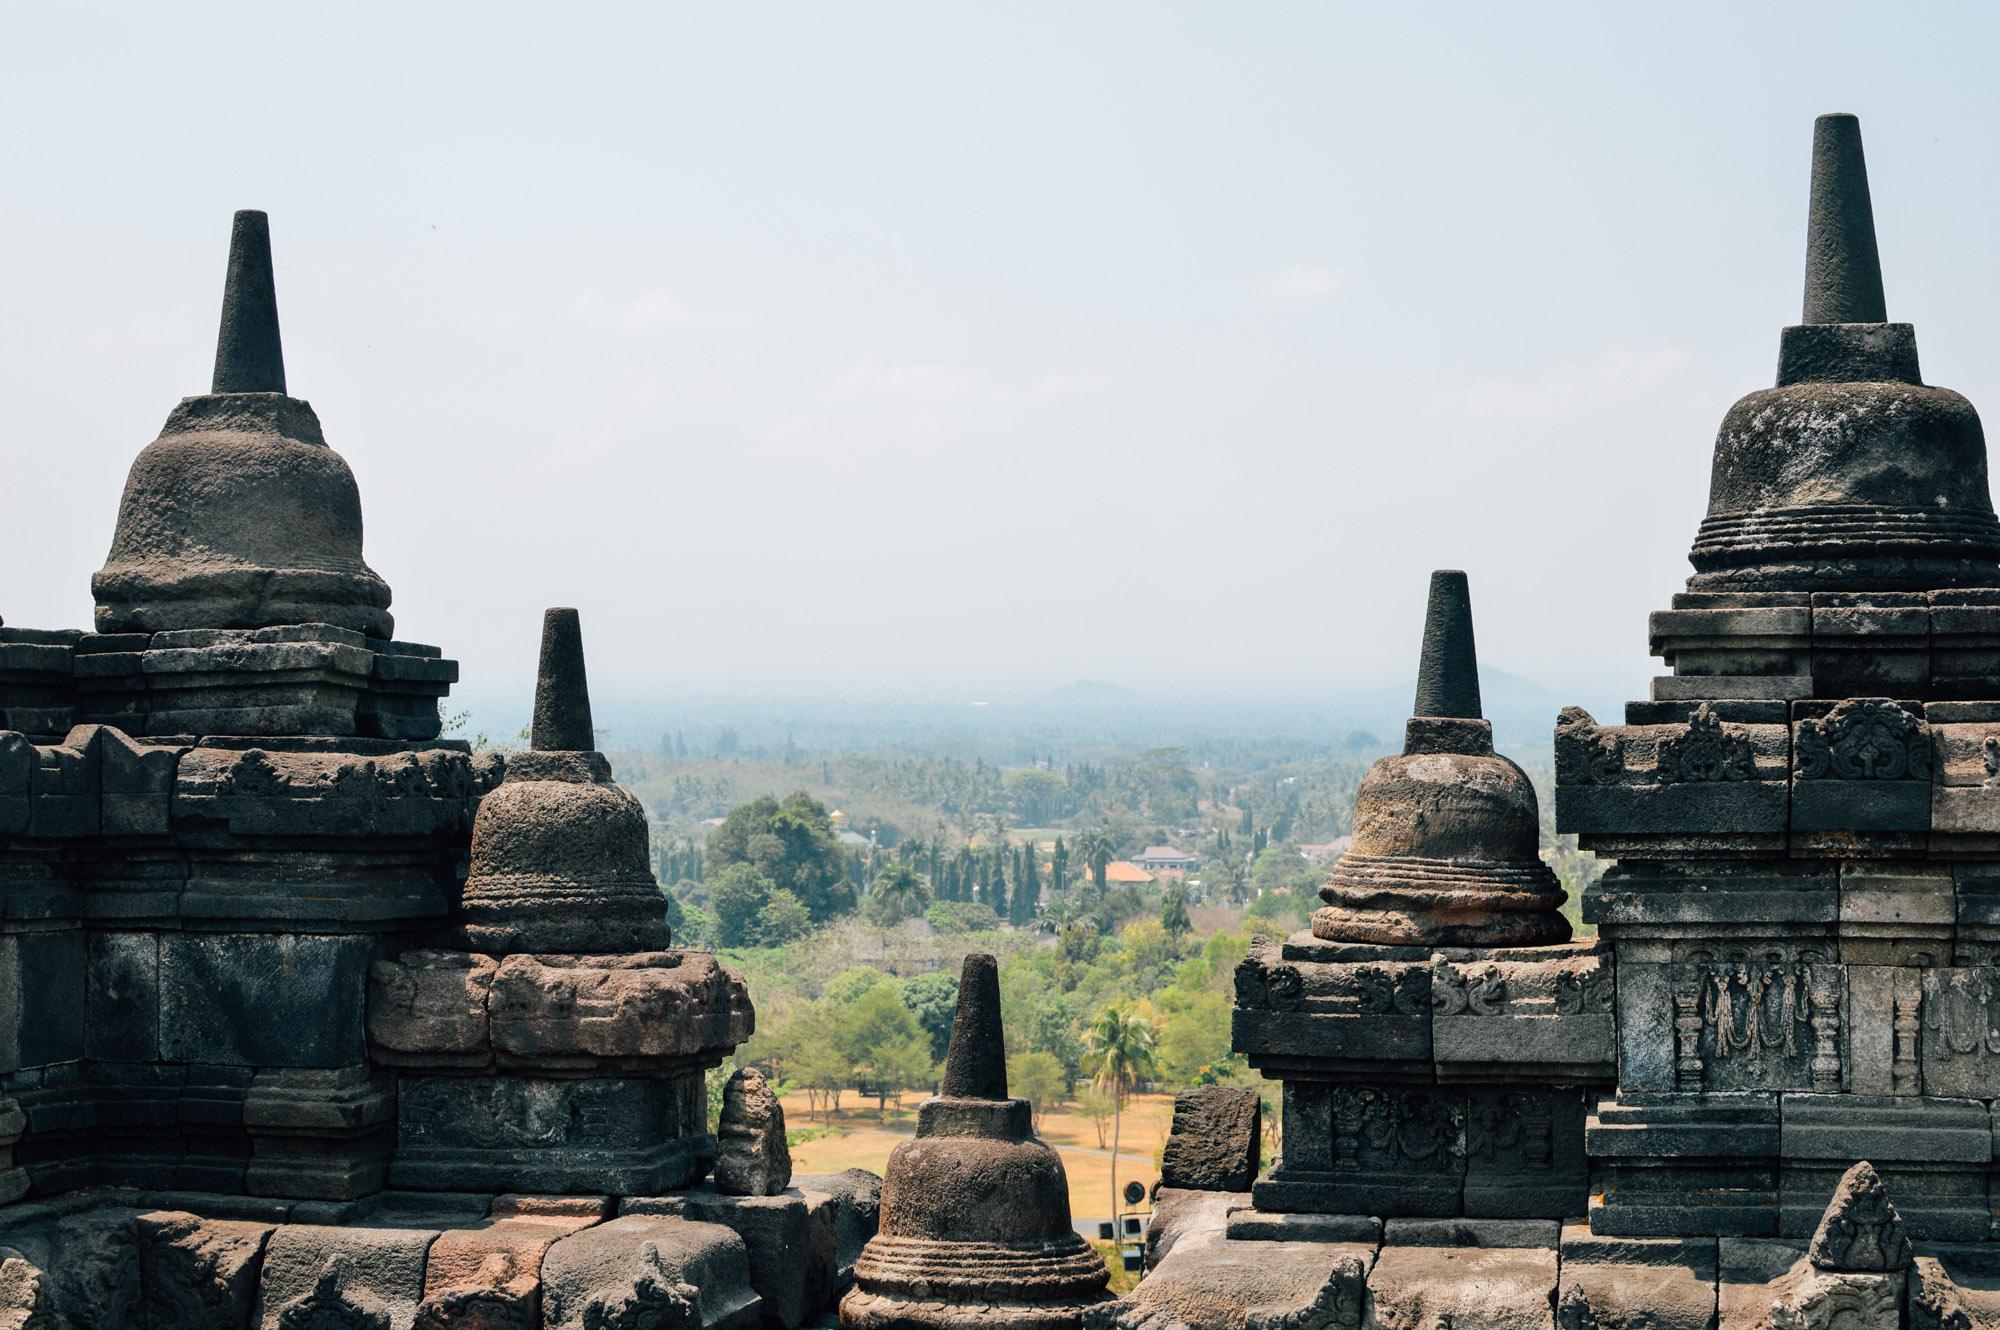 yogya 1 2 - Jogyakarta met Tempels